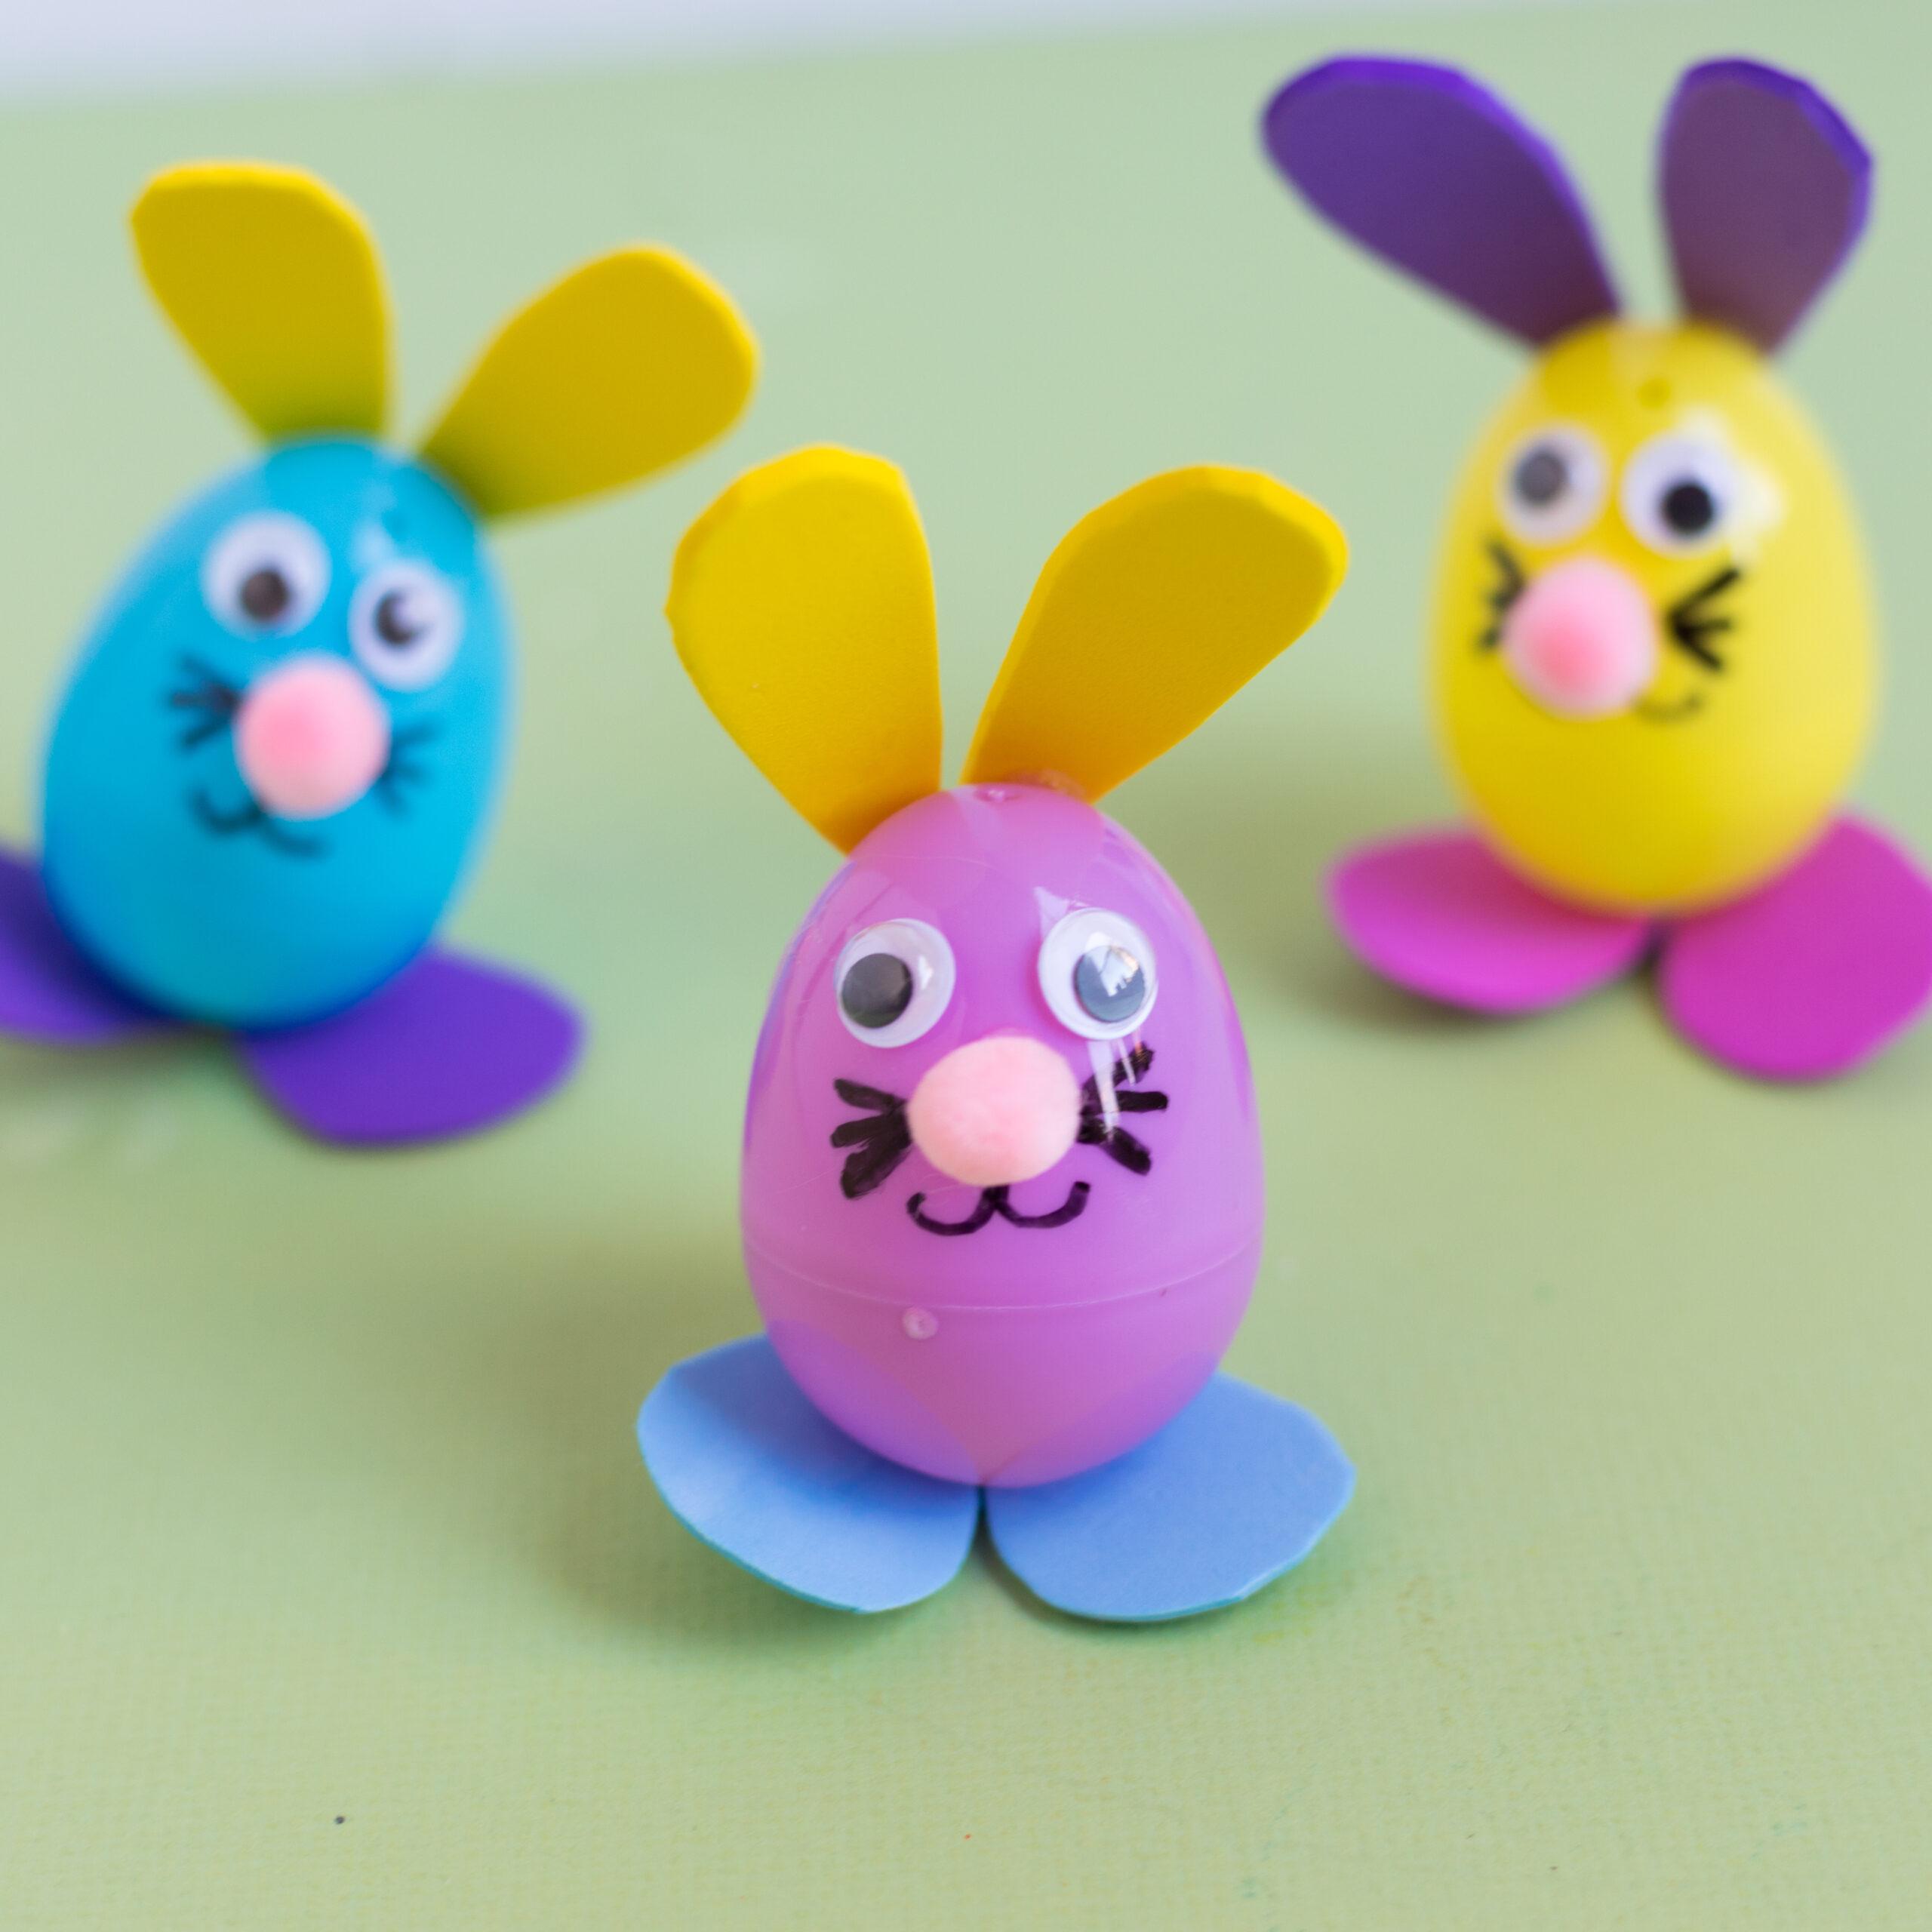 Plastic eggs decorated like Easter bunnies